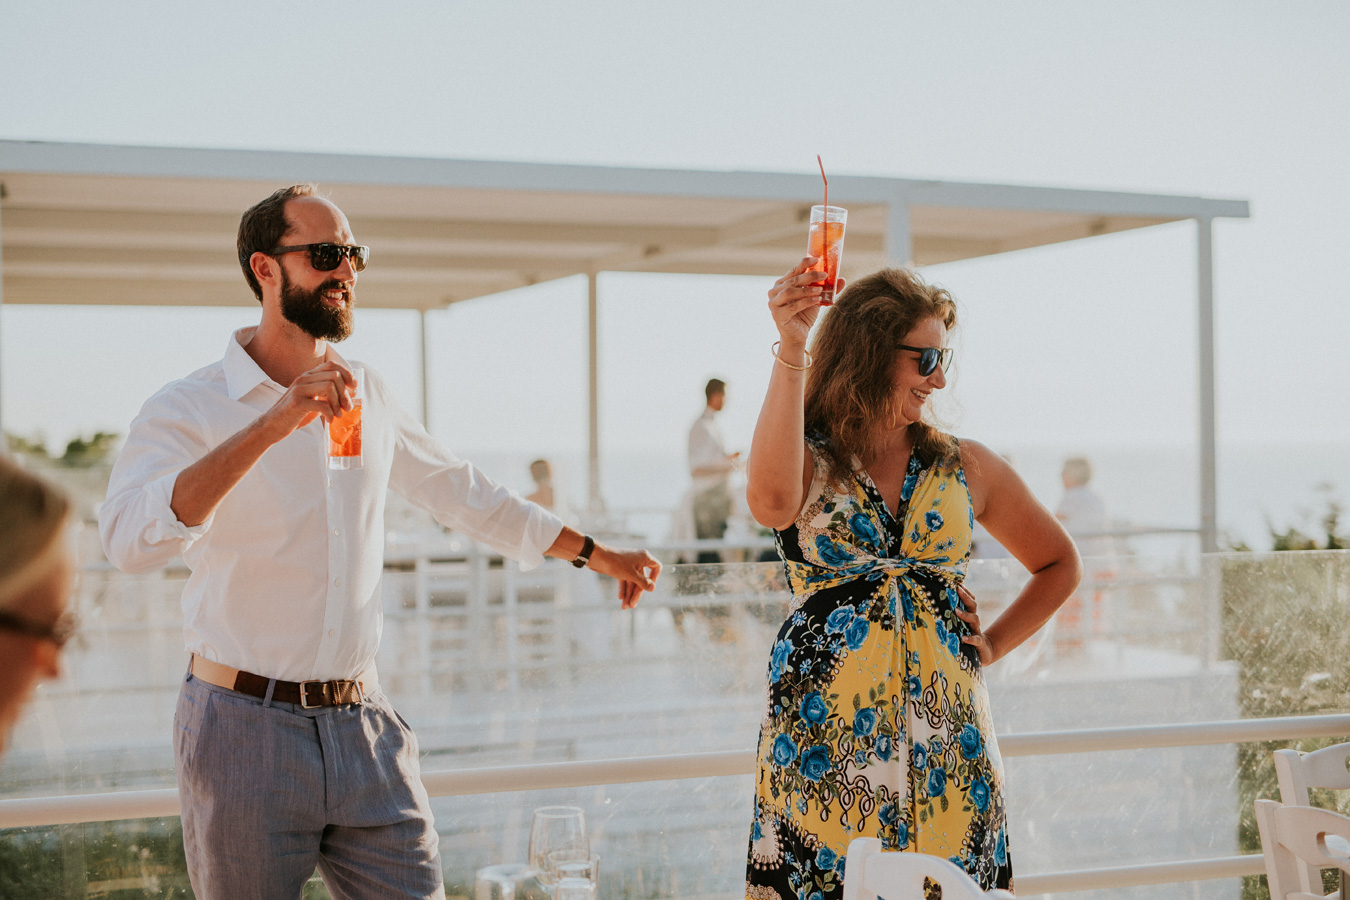 007-bryllupsfotograf-oslo-destinasjonsbryllup-fotograf-tone-tvedt.jpg